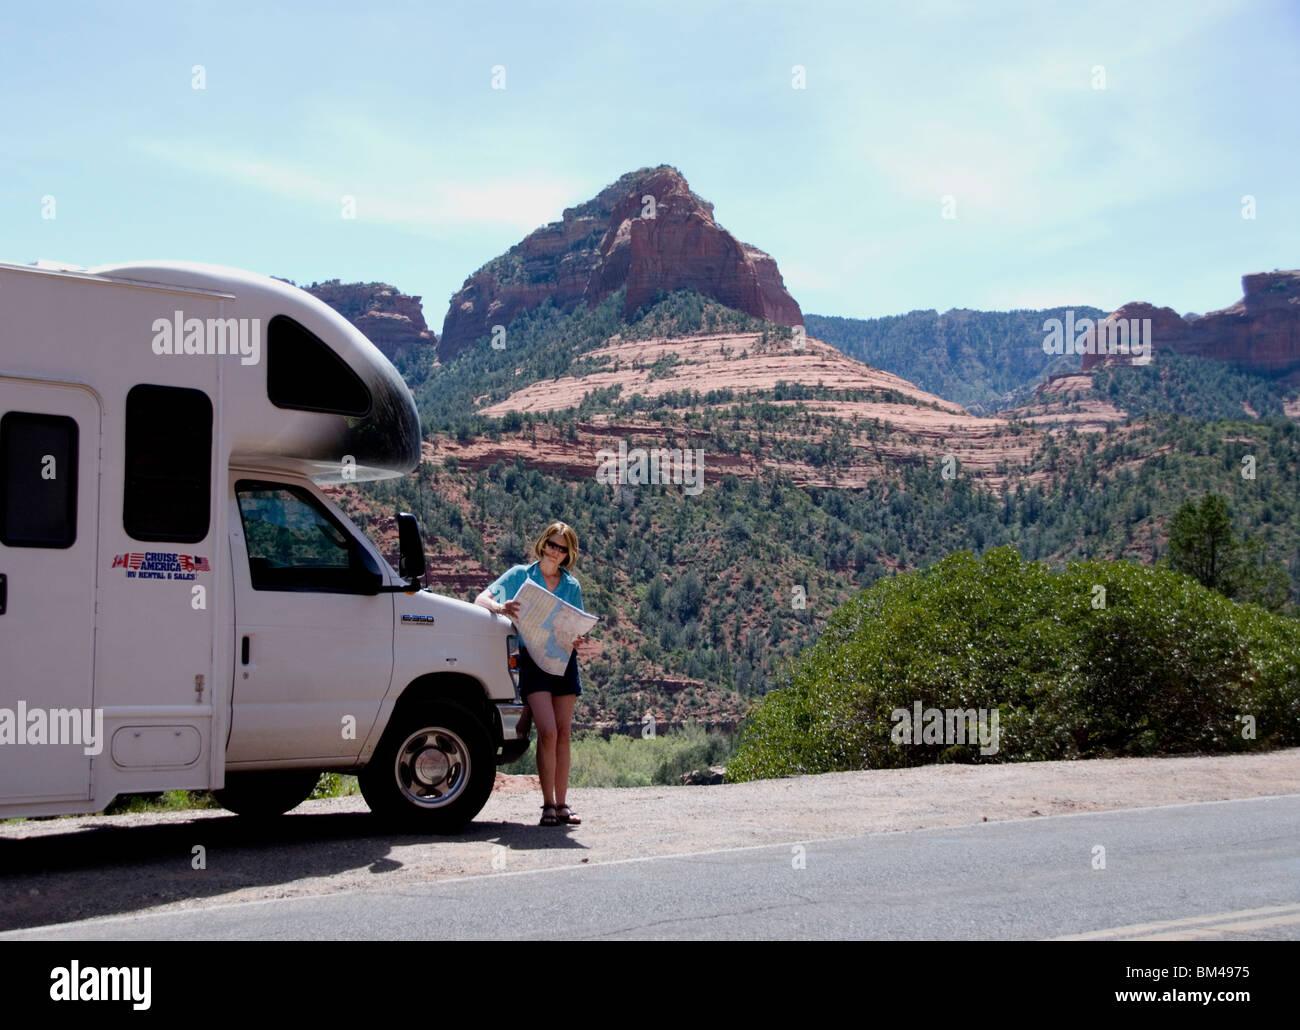 Woman reading map rented RV recreational vehicle Cruise America in Oak Creek Canyon Sedona Arizona USA Kimberly - Stock Image